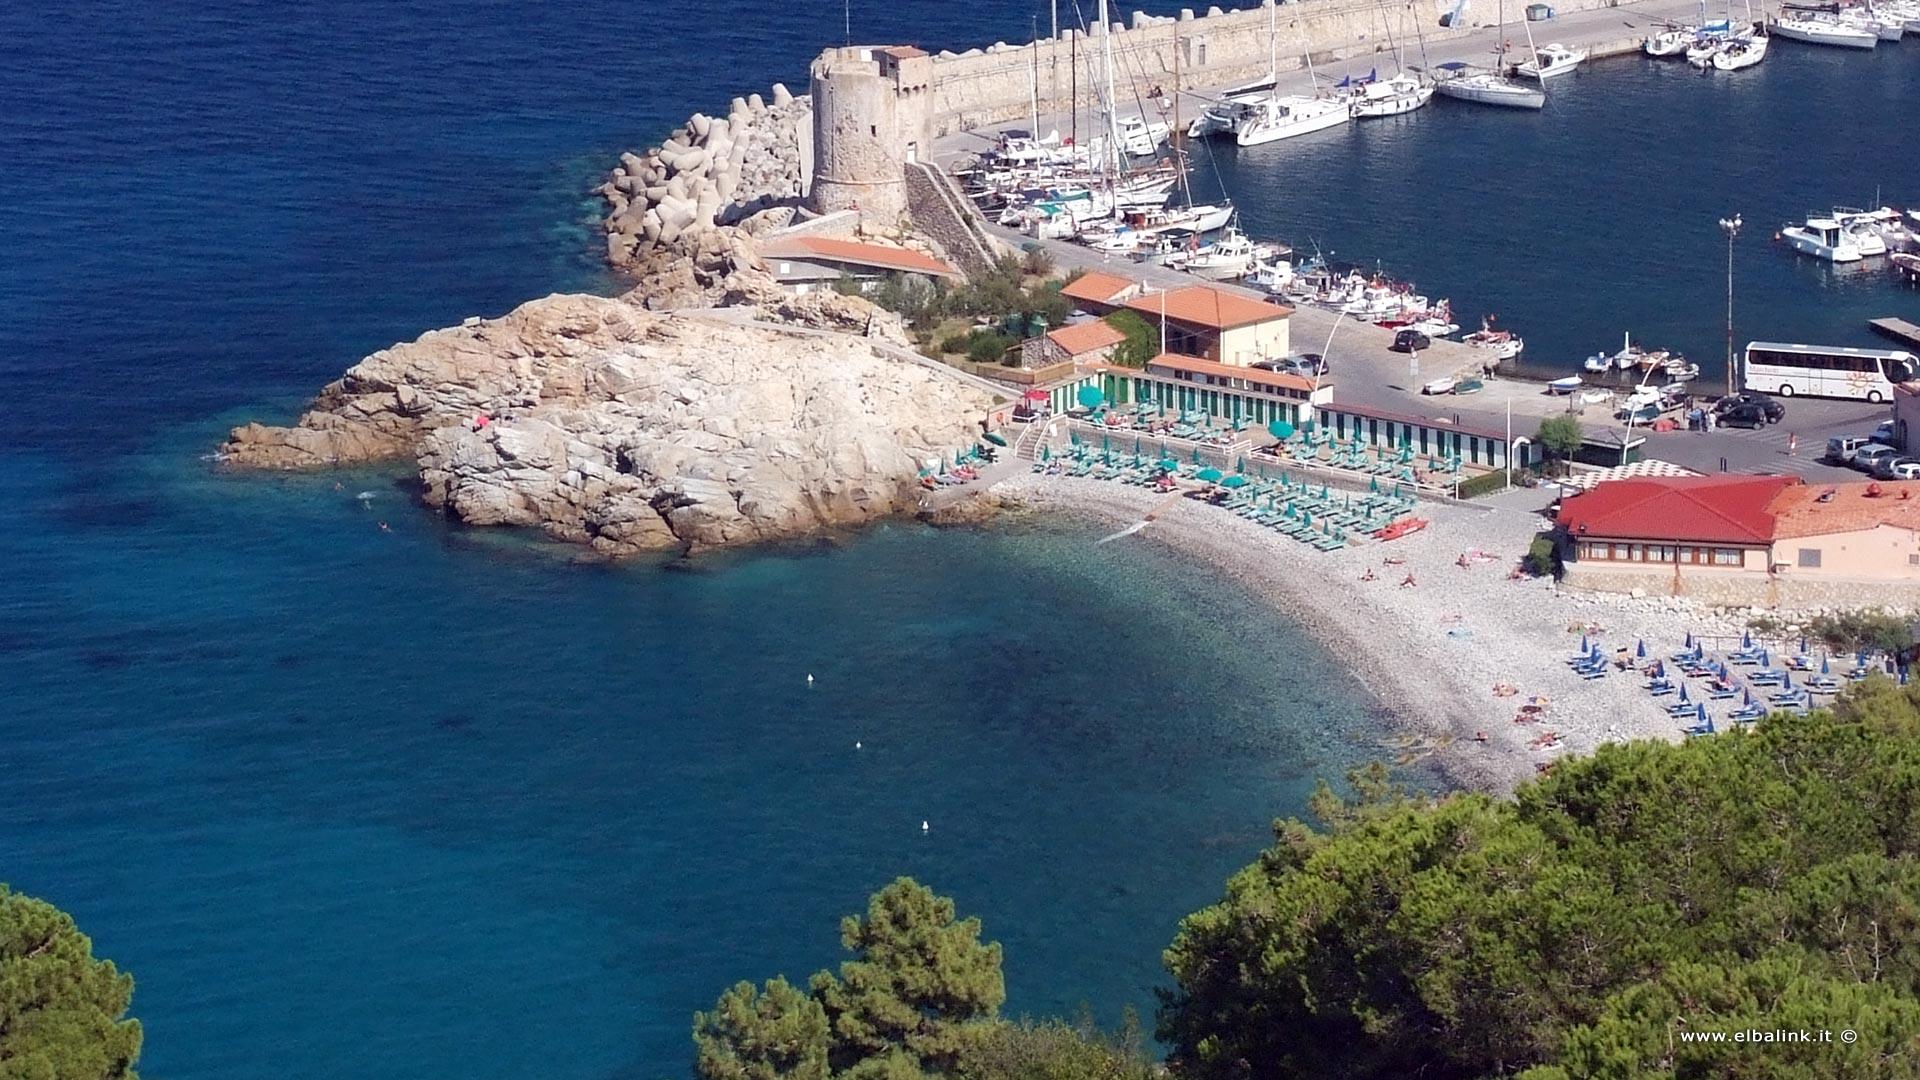 Kayak Rent A Car >> Fenicia beach in Marciana Marina |Island Elba beaches